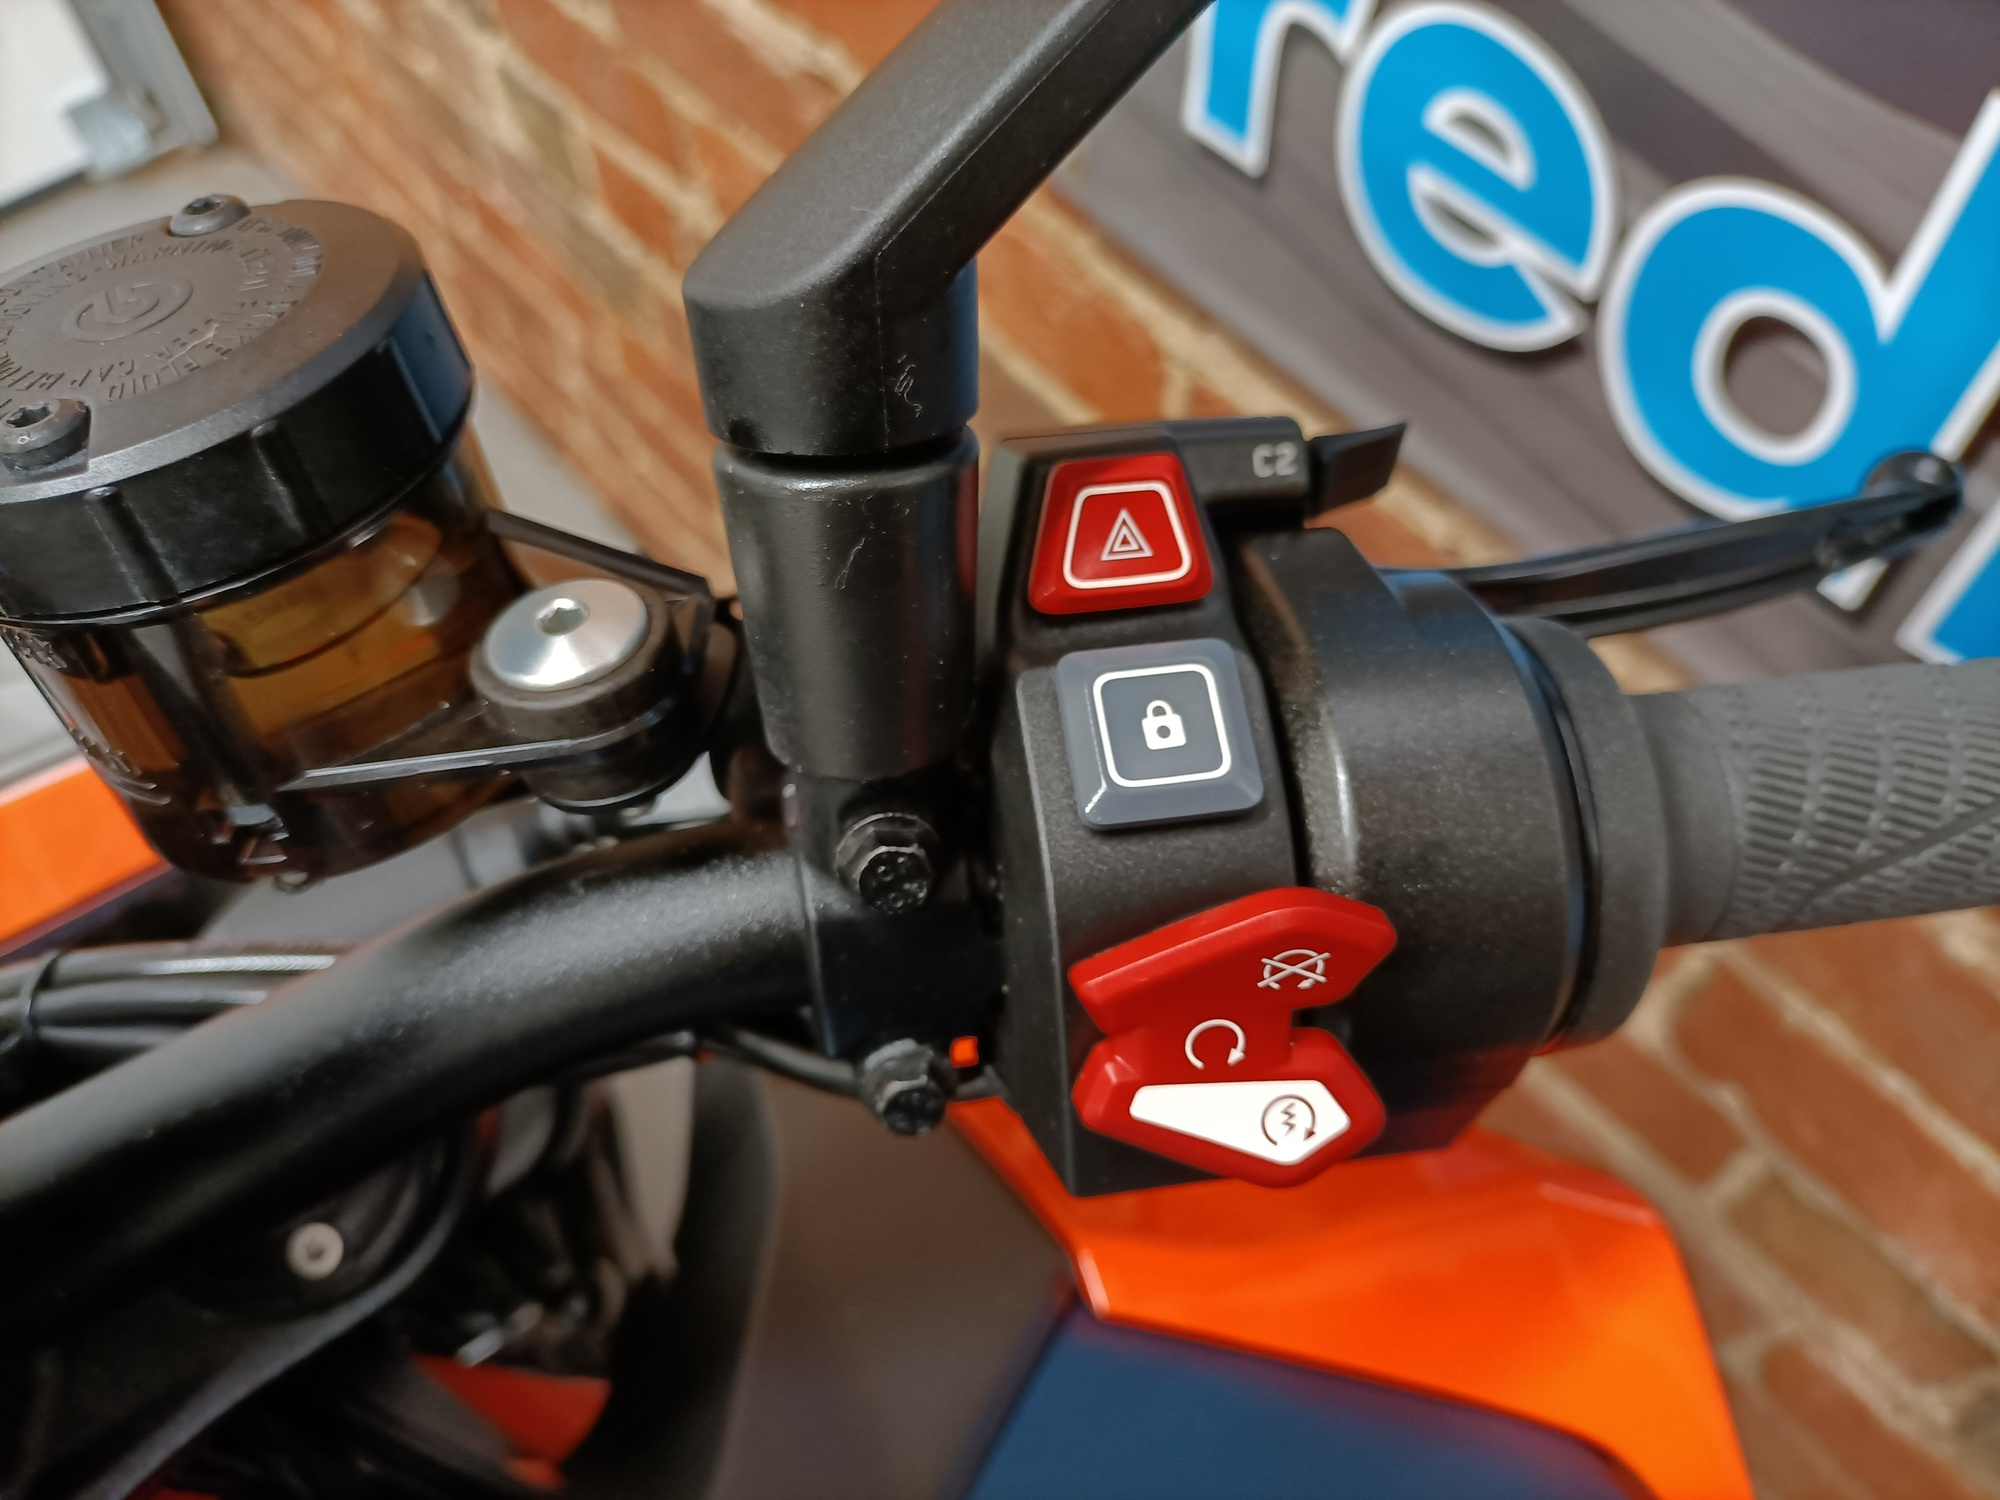 2020 KTM 1290 SUPERDUKE R TRACK PACK LOW MILEAGE